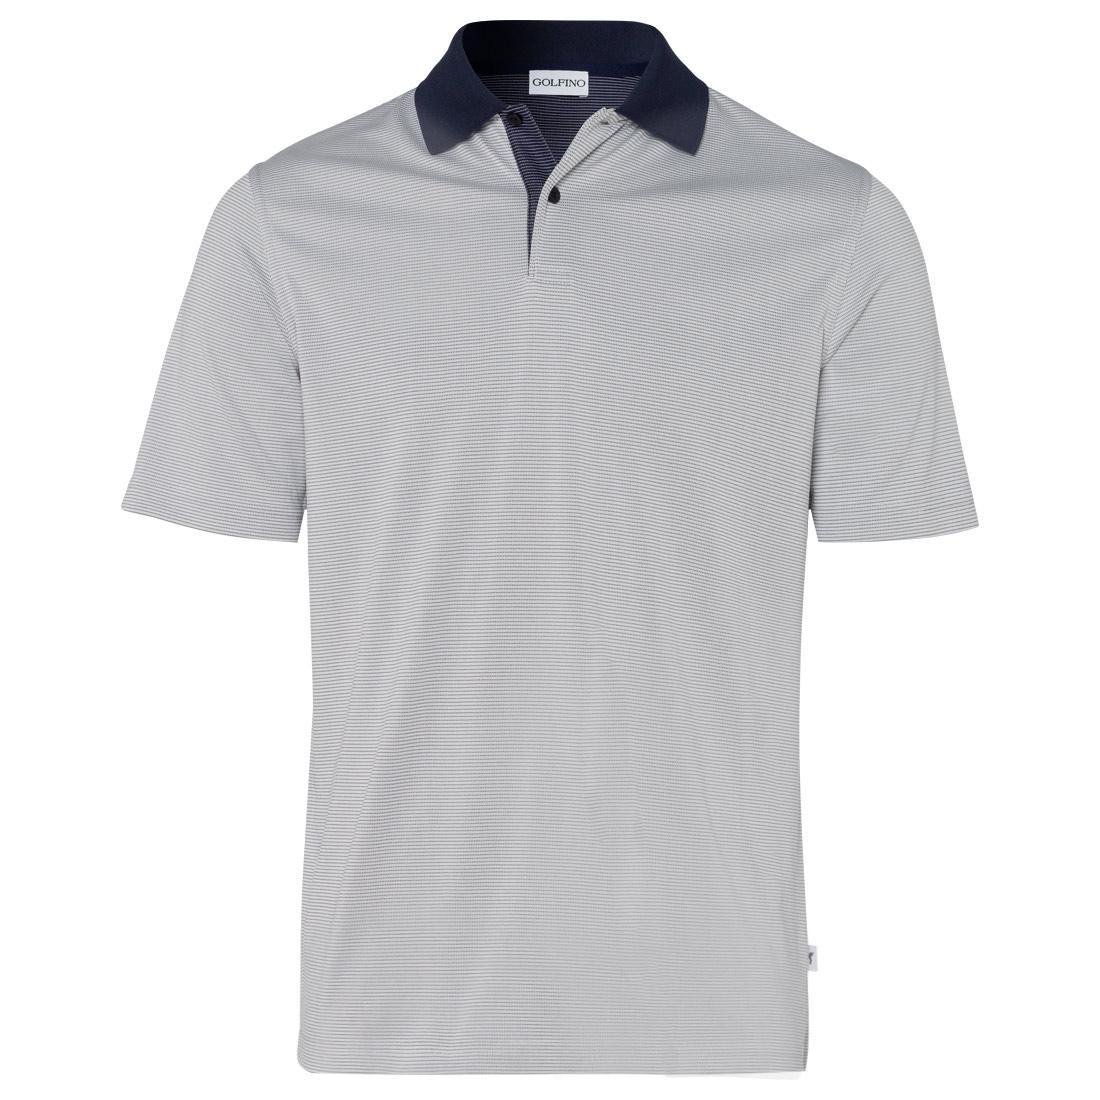 Herren Funktions-Kurzarm-Golfpolo